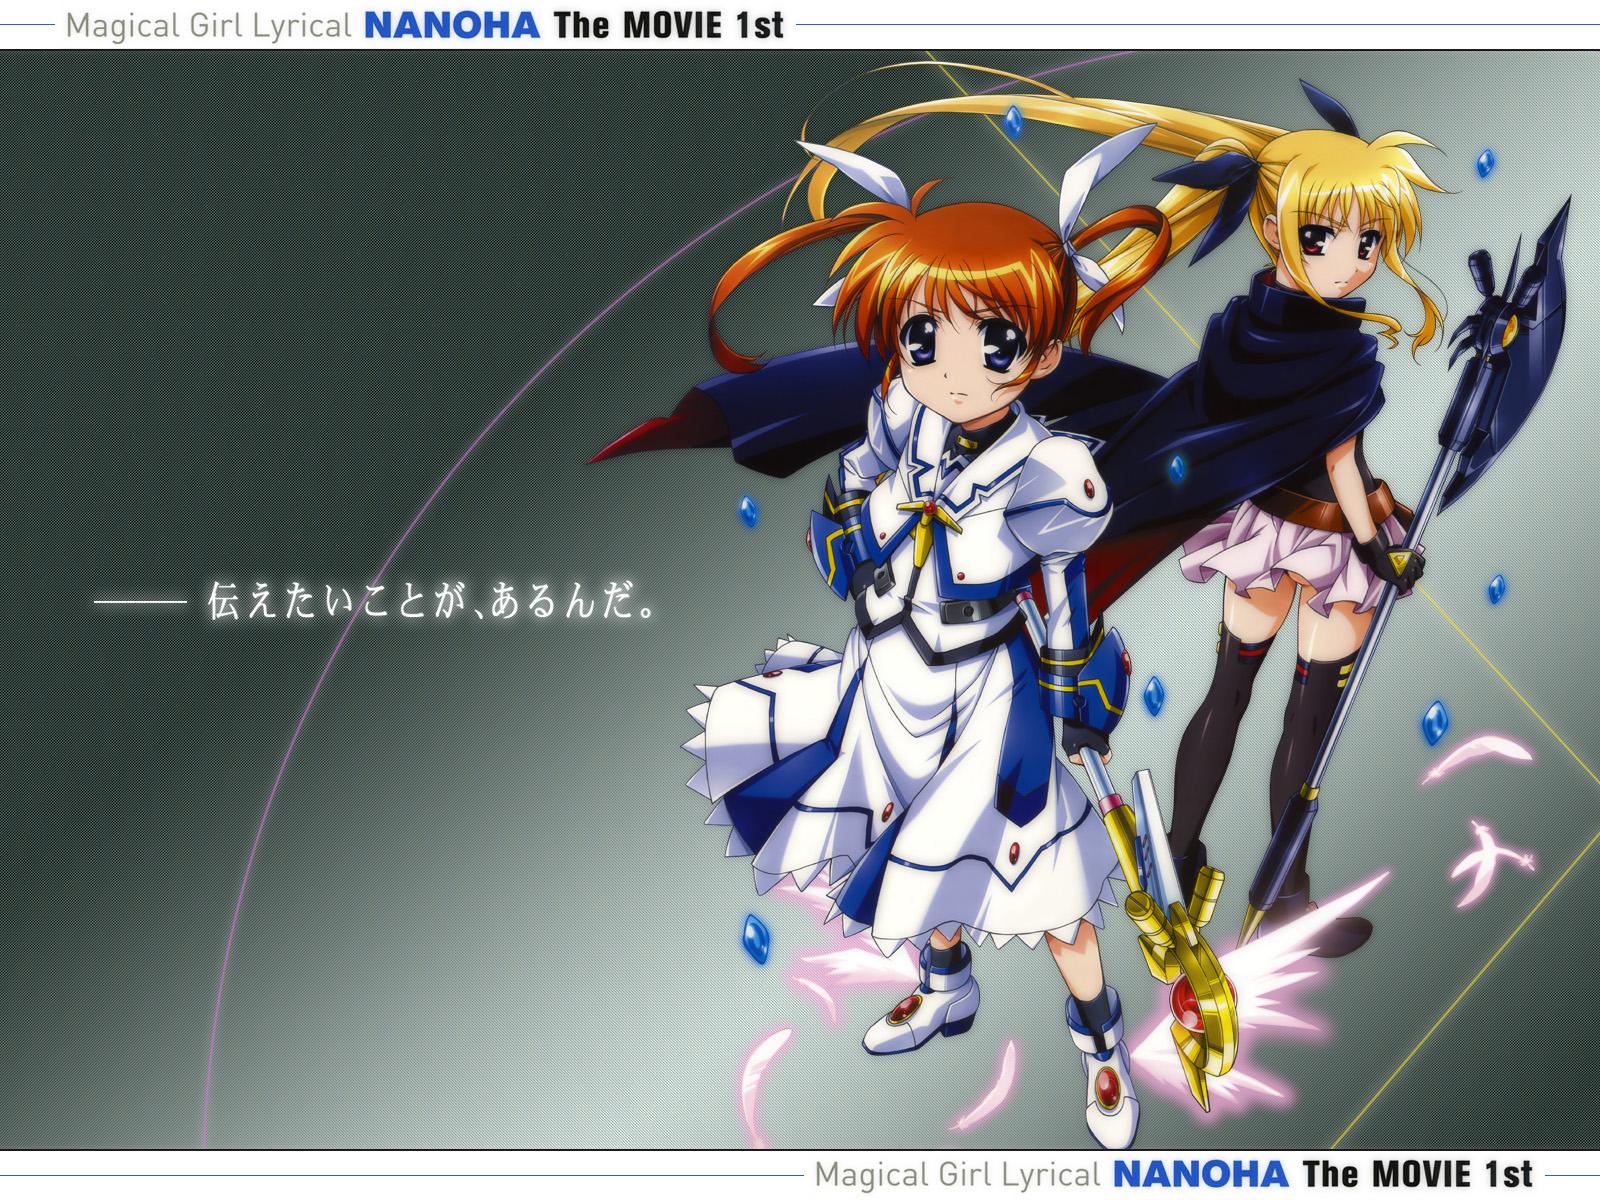 fate_testarossa mahou_shoujo_lyrical_nanoha mahou_shoujo_lyrical_nanoha_the_movie_1st takamachi_nanoha thighhighs